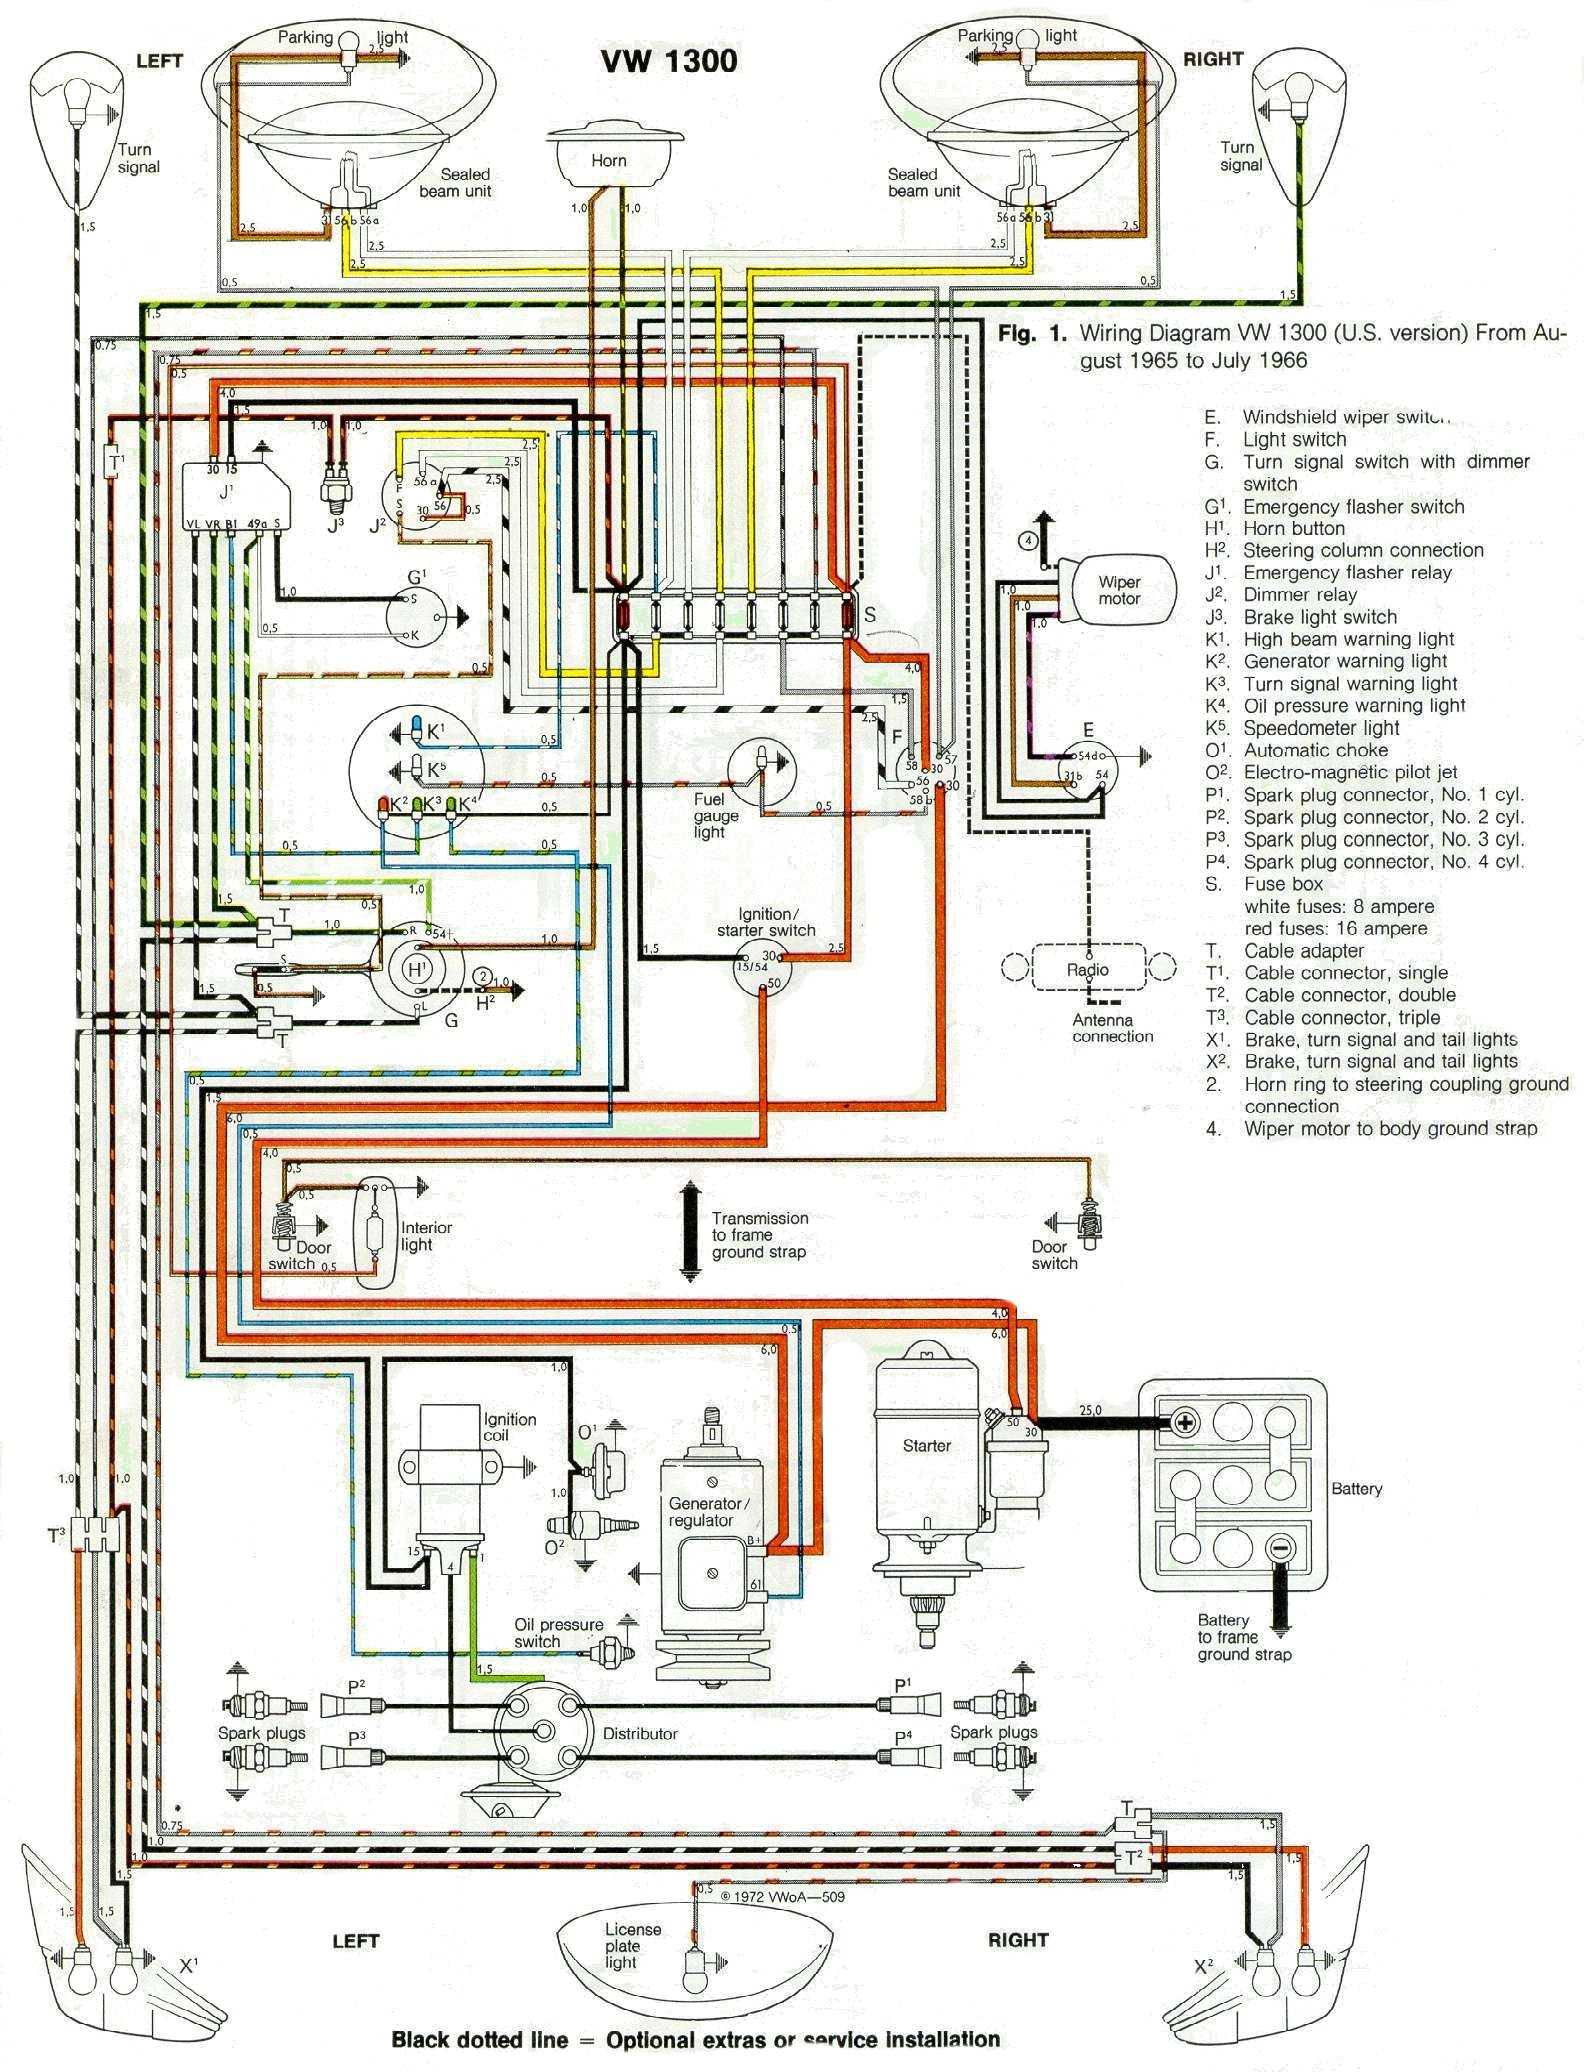 1966 Wiring Diagram 1965 Vw Bug Wiring 7 At VW Bug Wiring Harness